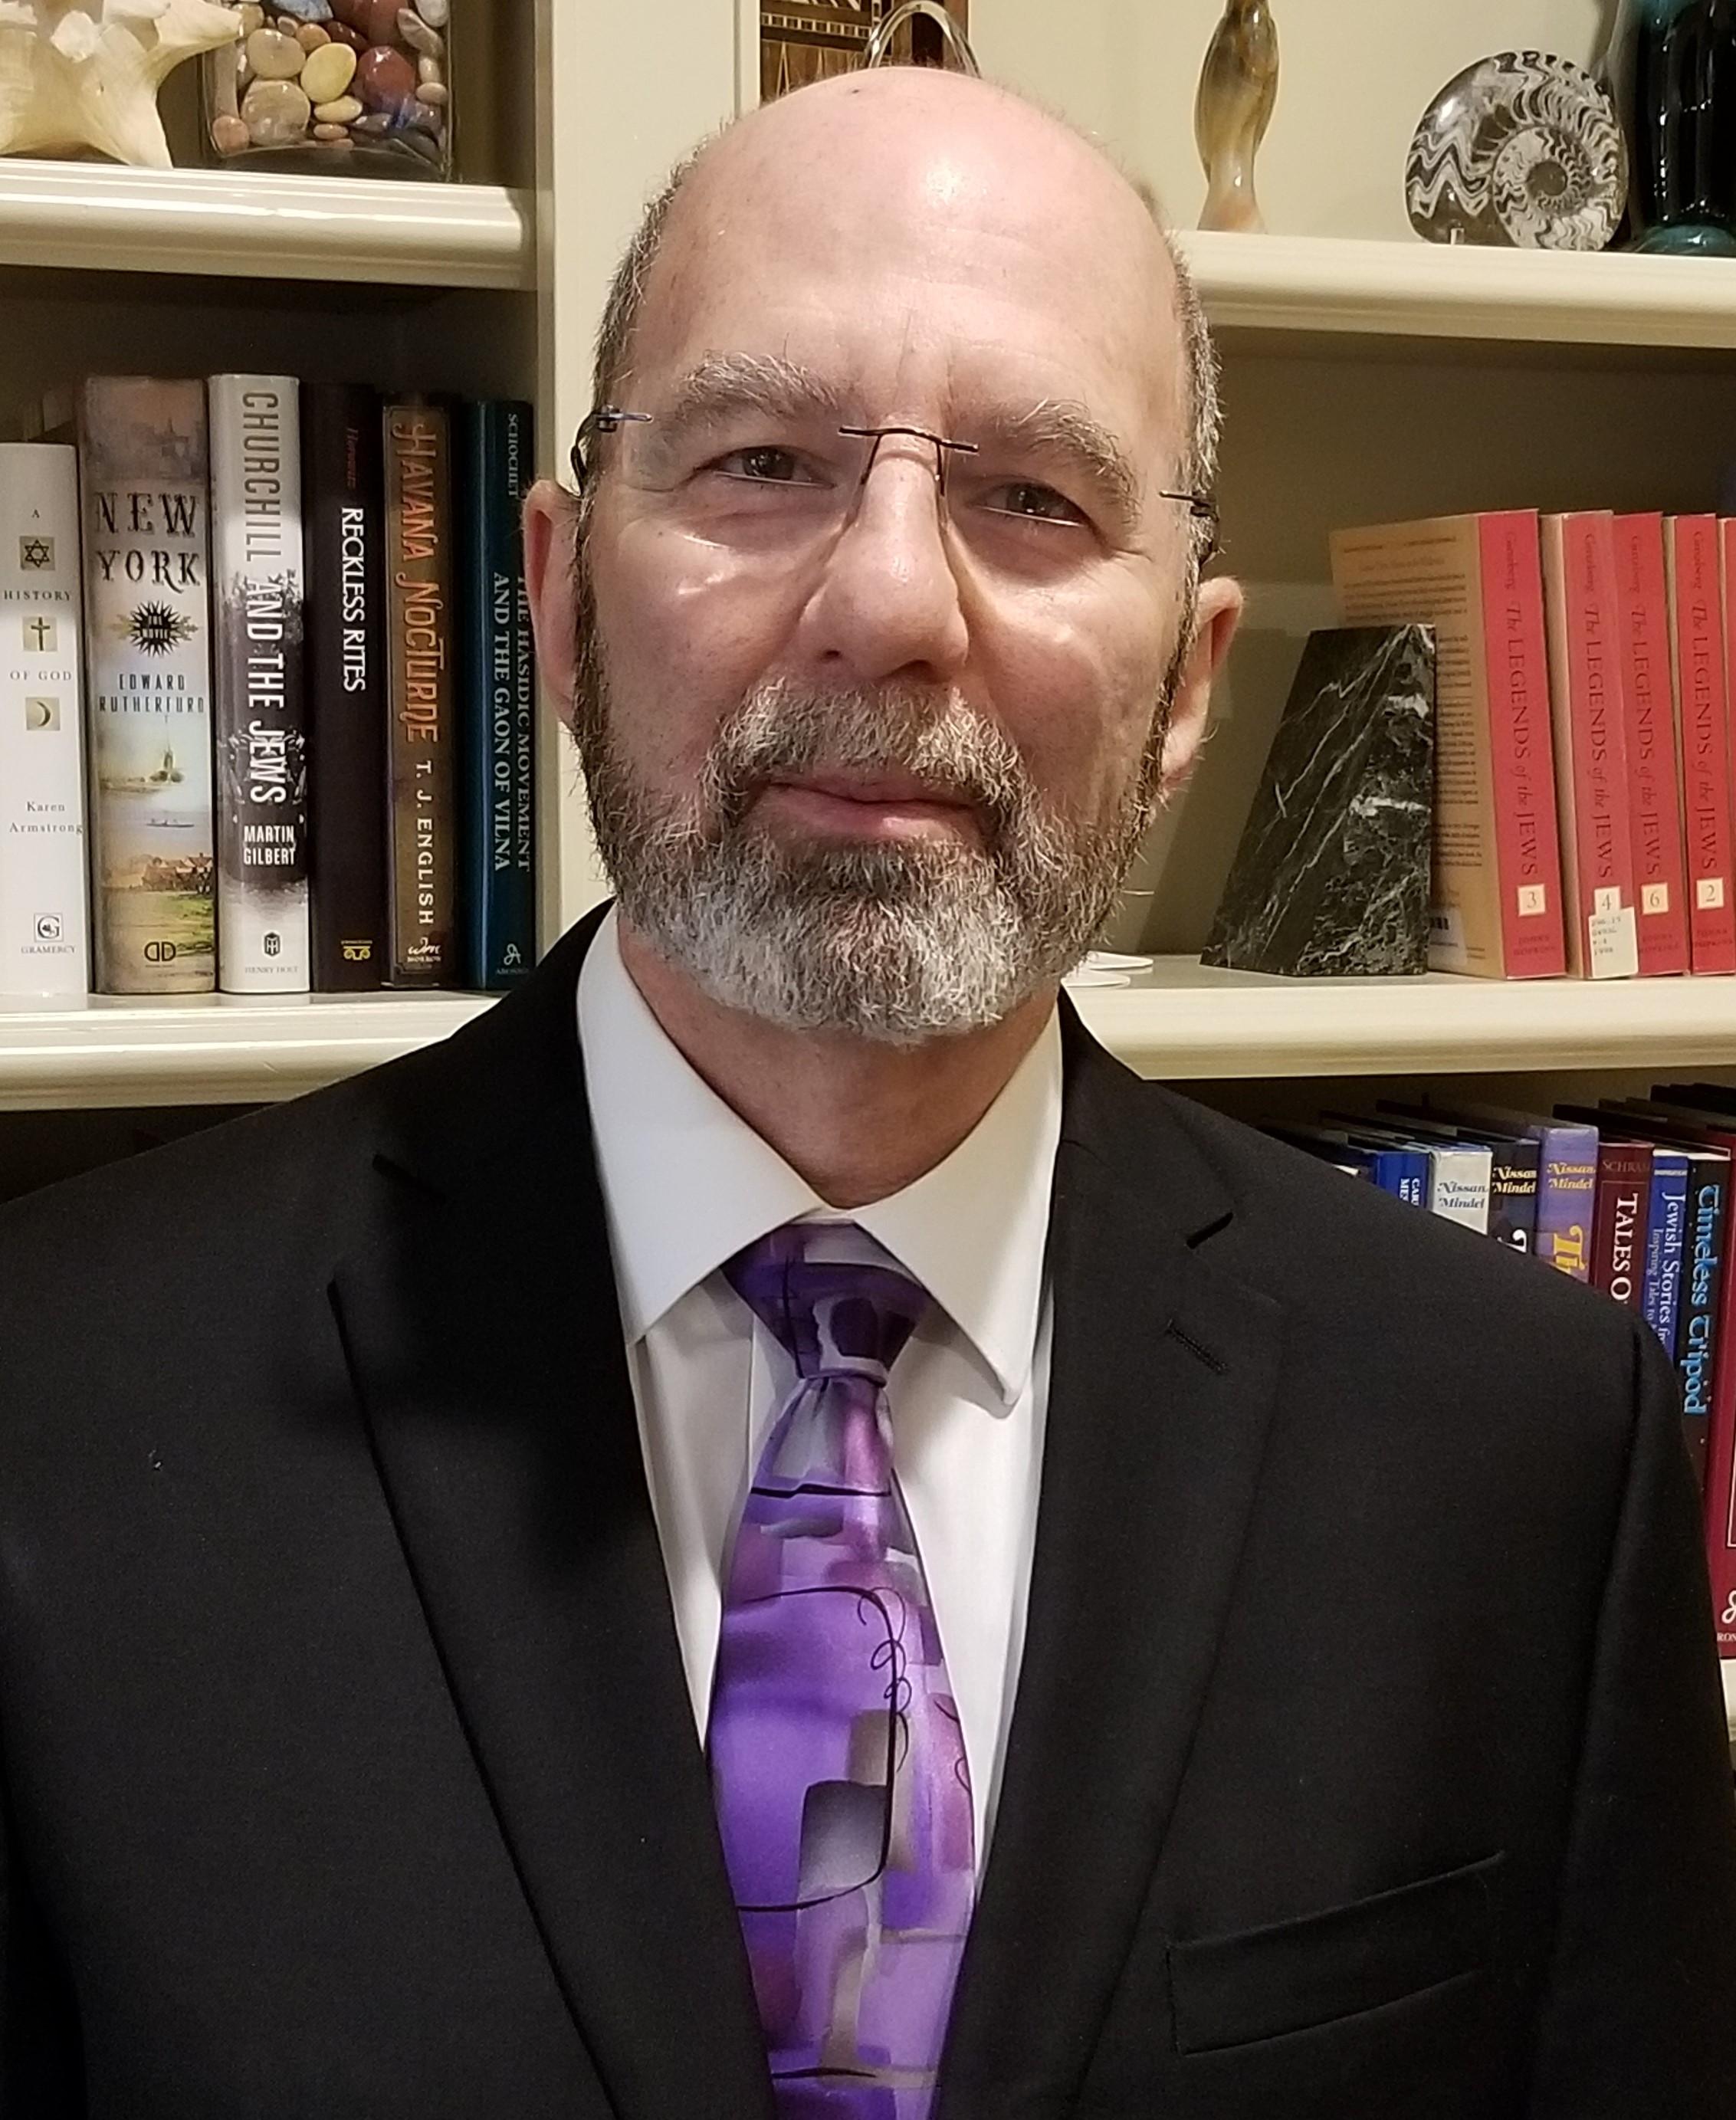 Steven Lerman